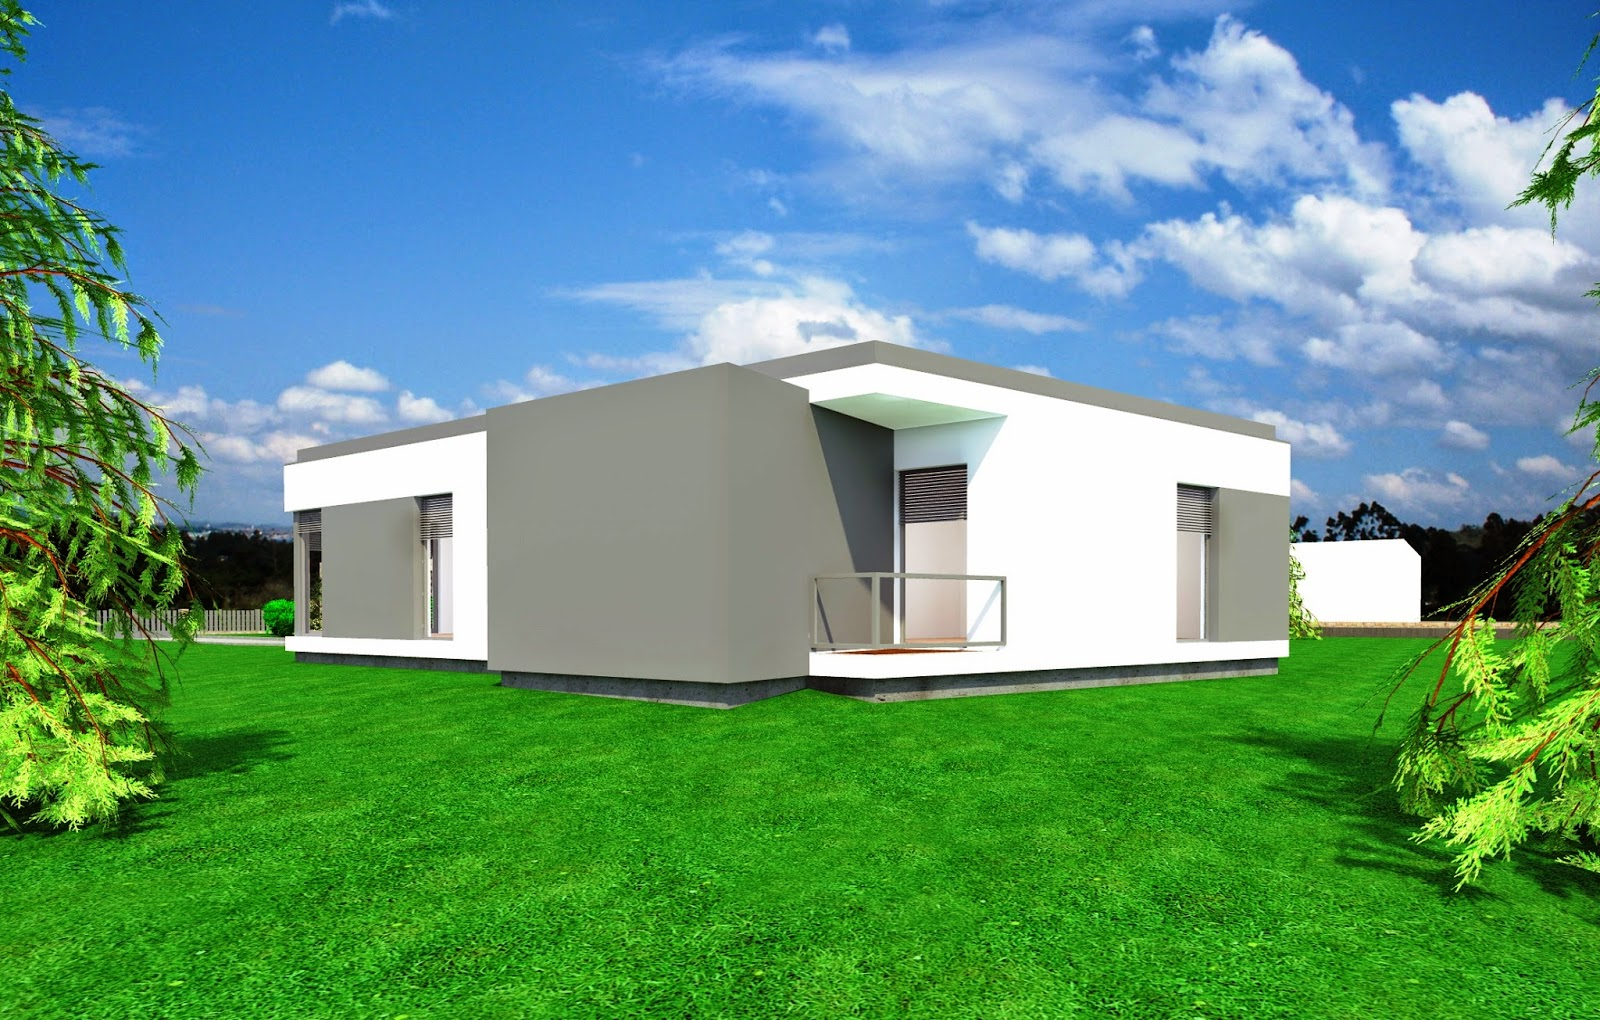 Casas Modulares - Steel Houses: Steel Houses - Arouca